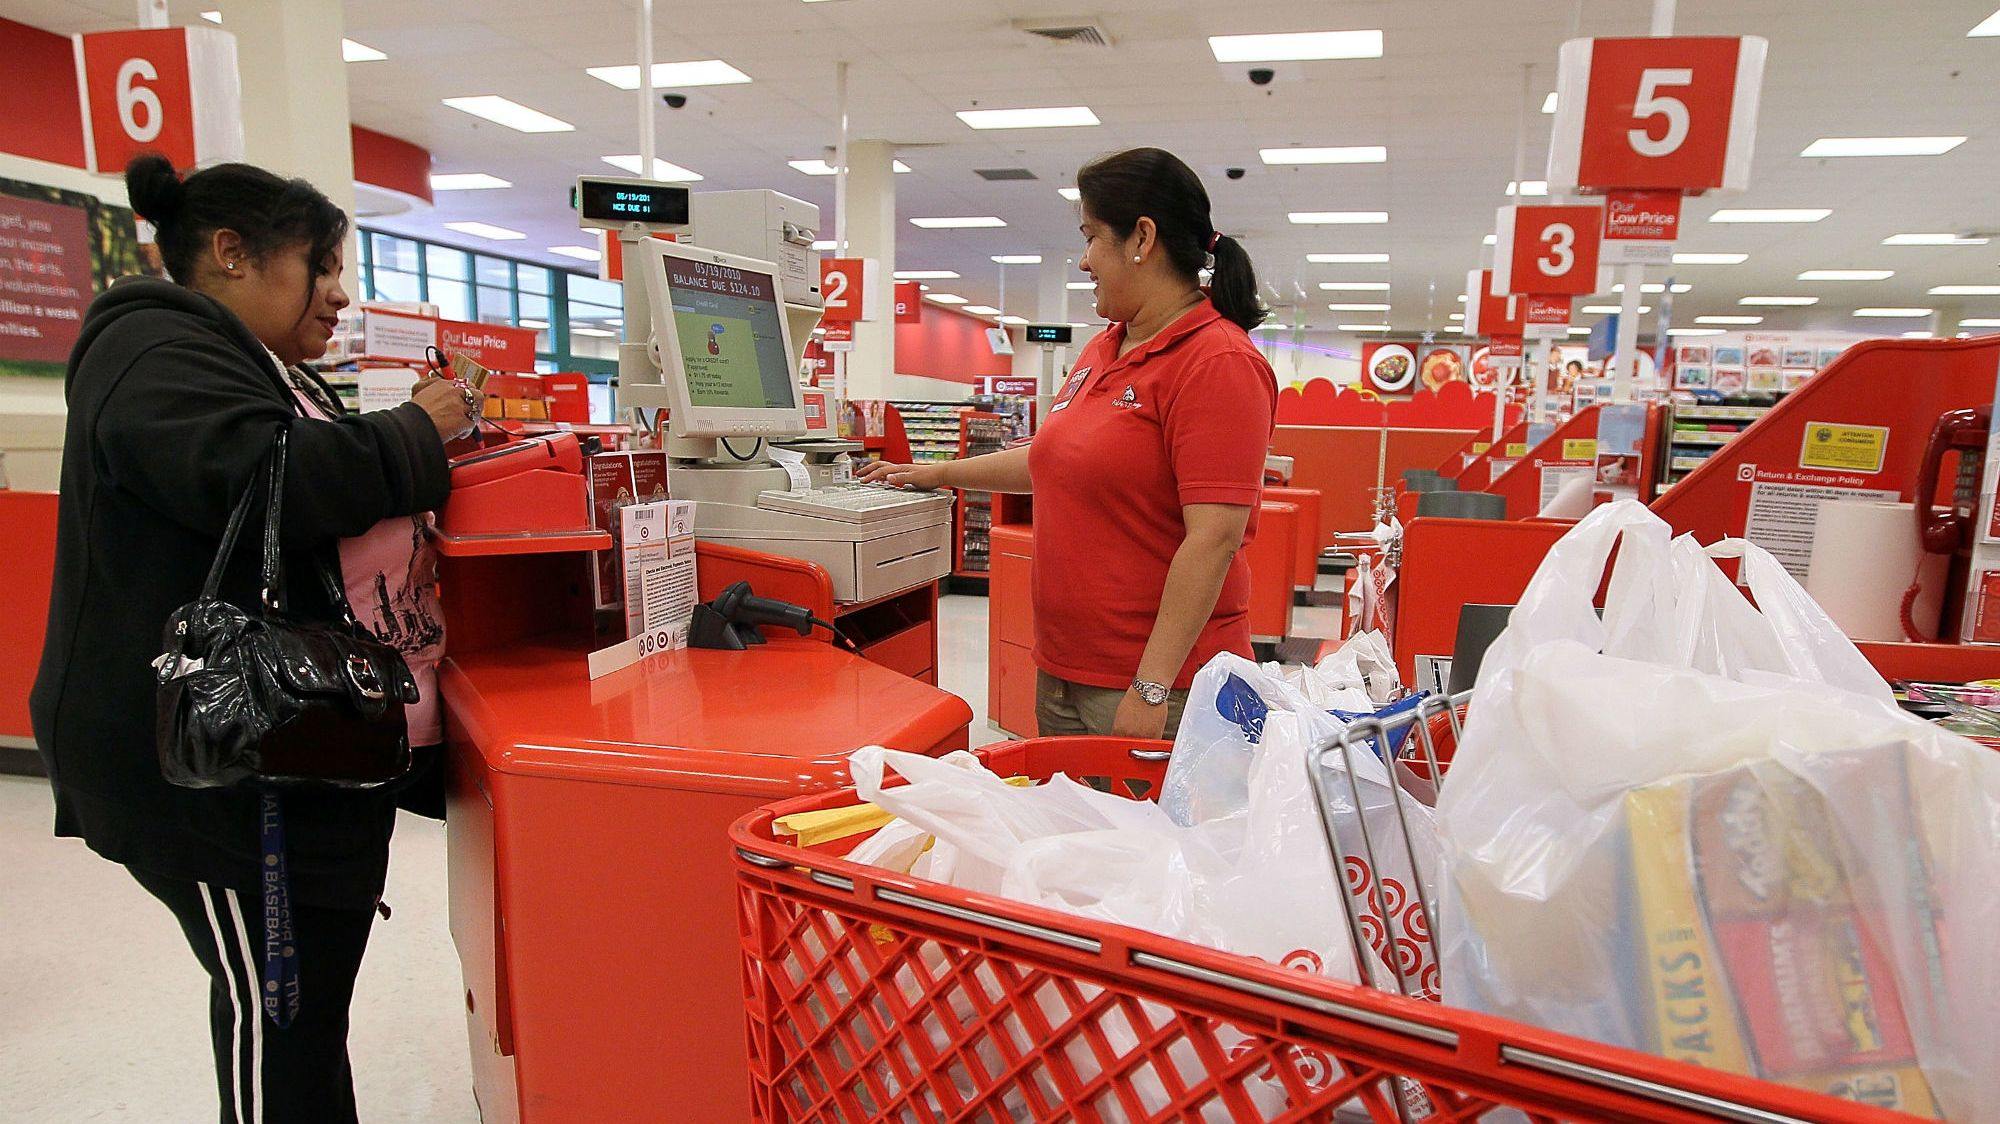 11 Secrets of Target Employees | Mental Floss